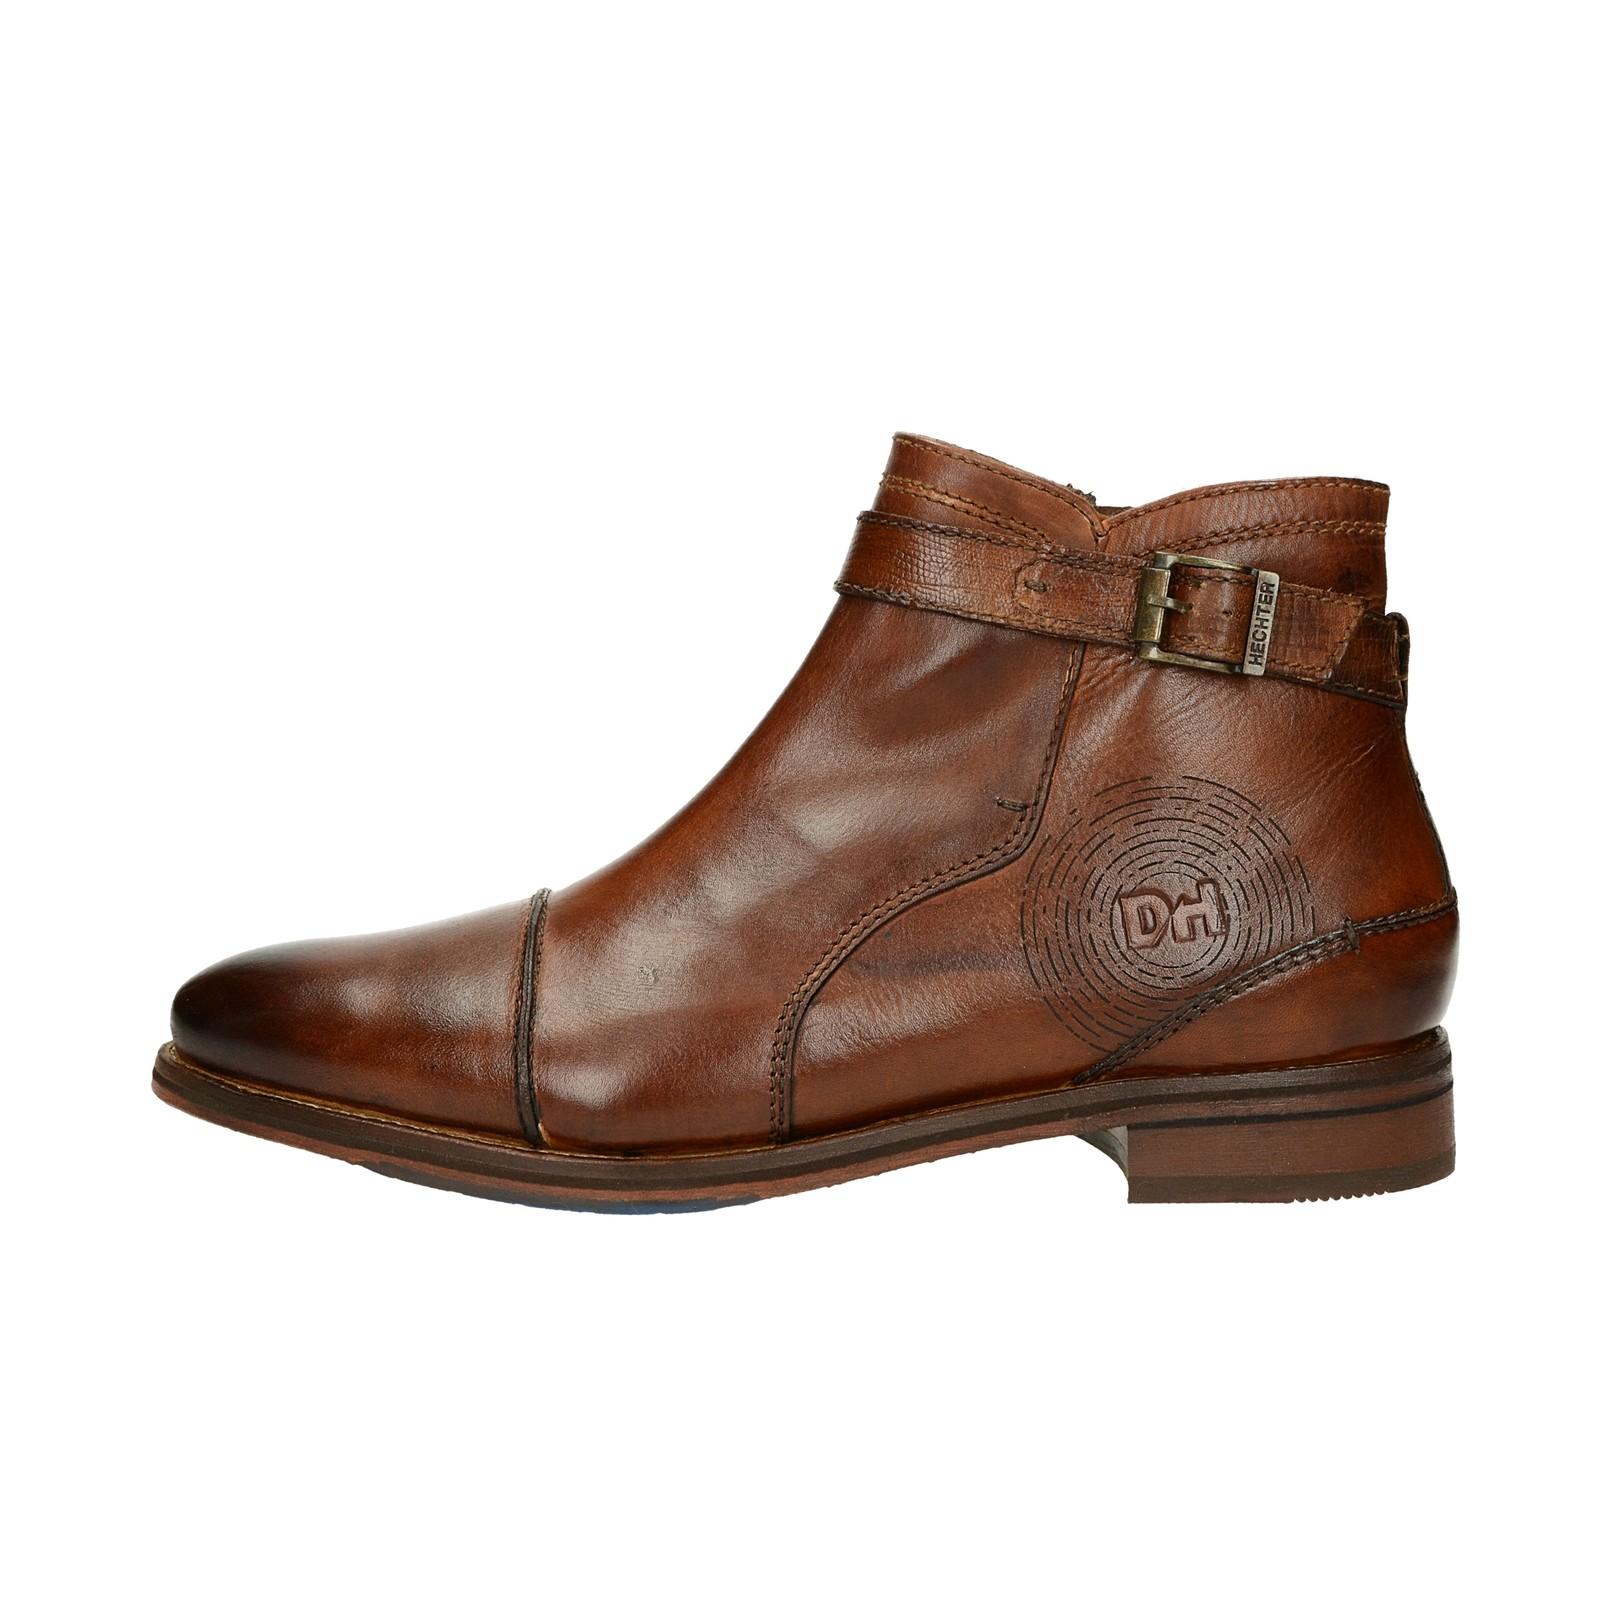 12b998a9c Daniel Hechter pánska zateplená členková obuv na zips - hnedá | 811 ...